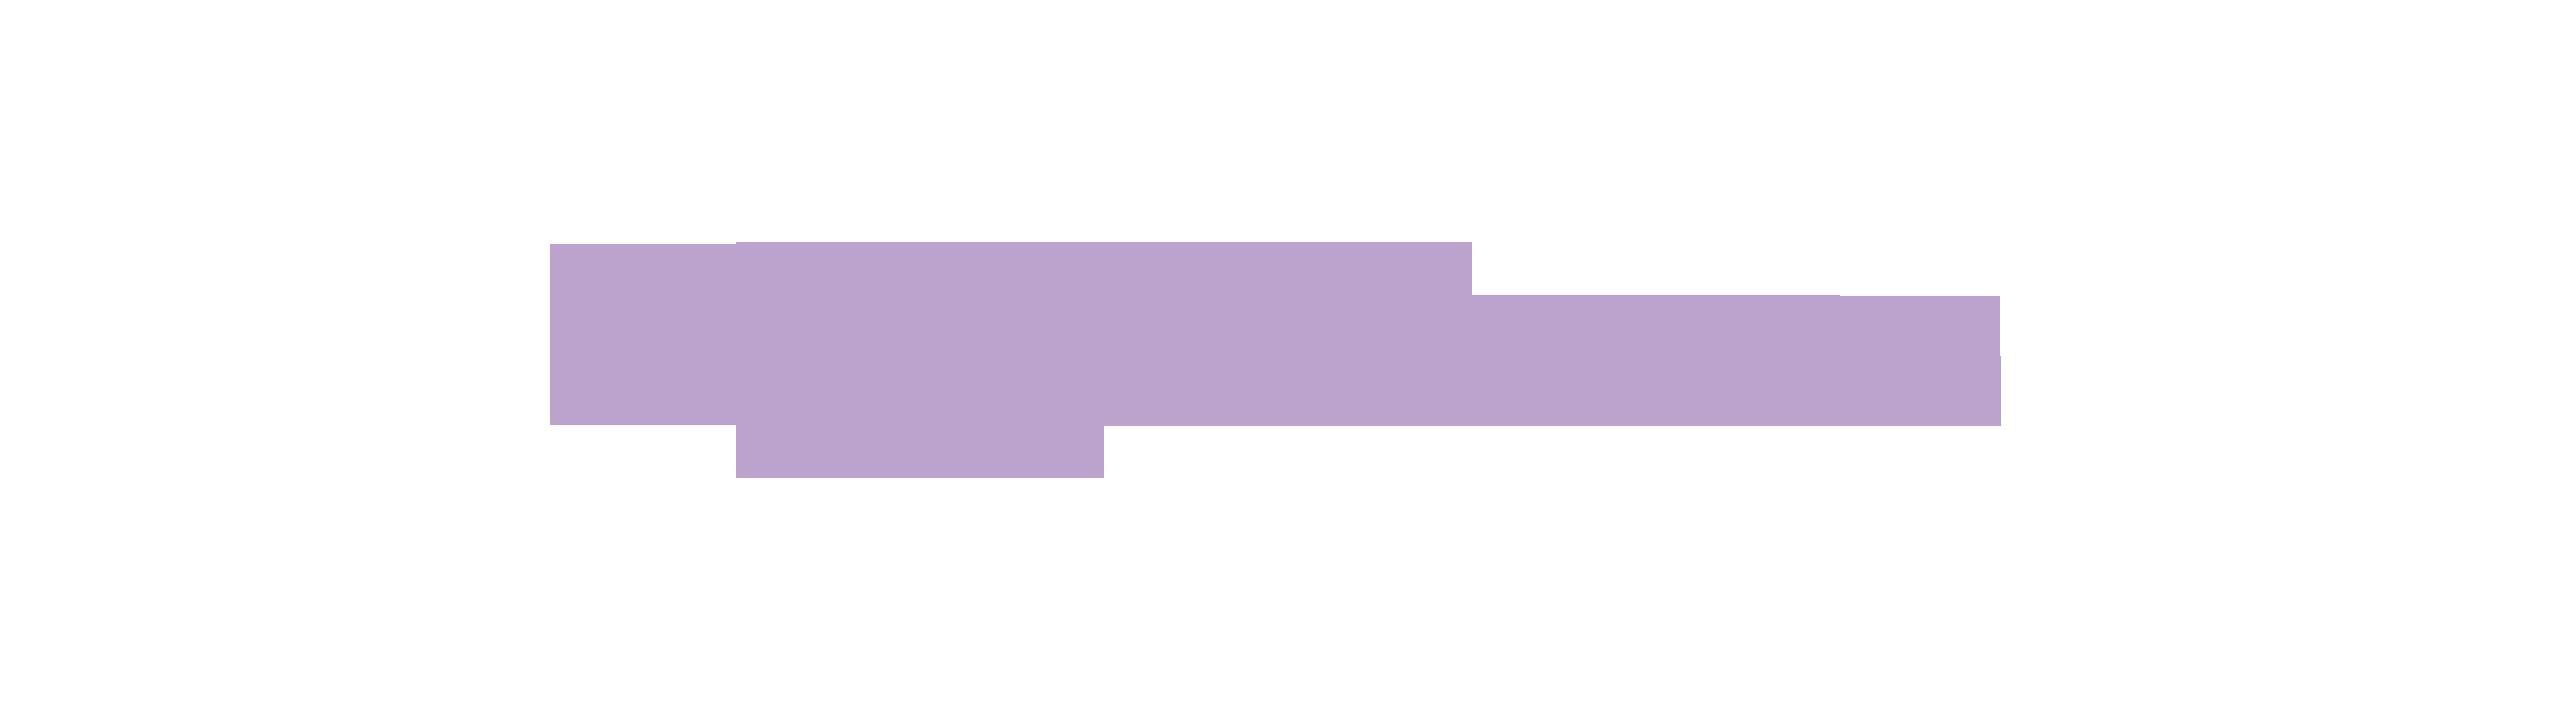 Olaya Alcaraz Psicoterapia breve